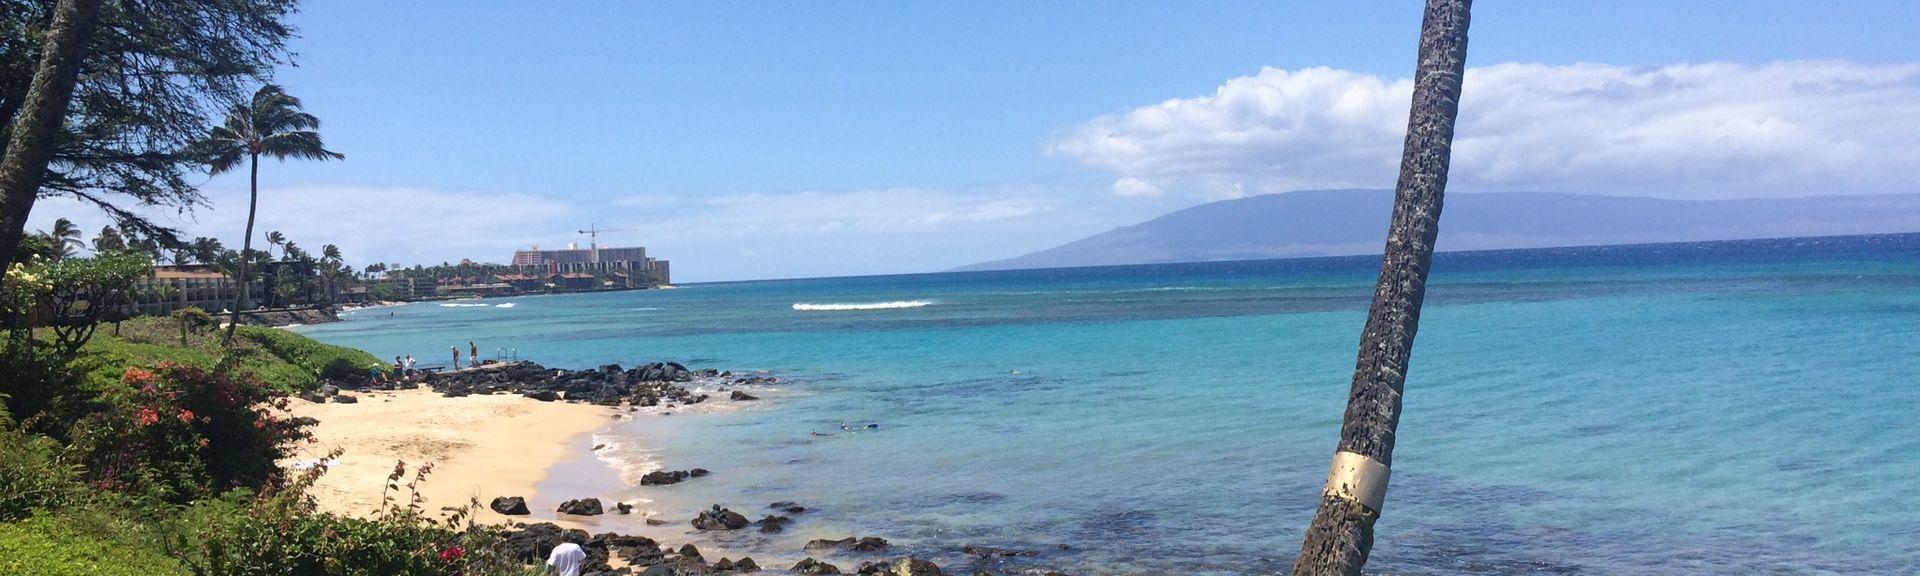 Polynesian Shores, Napili-Honokowai, HI, USA